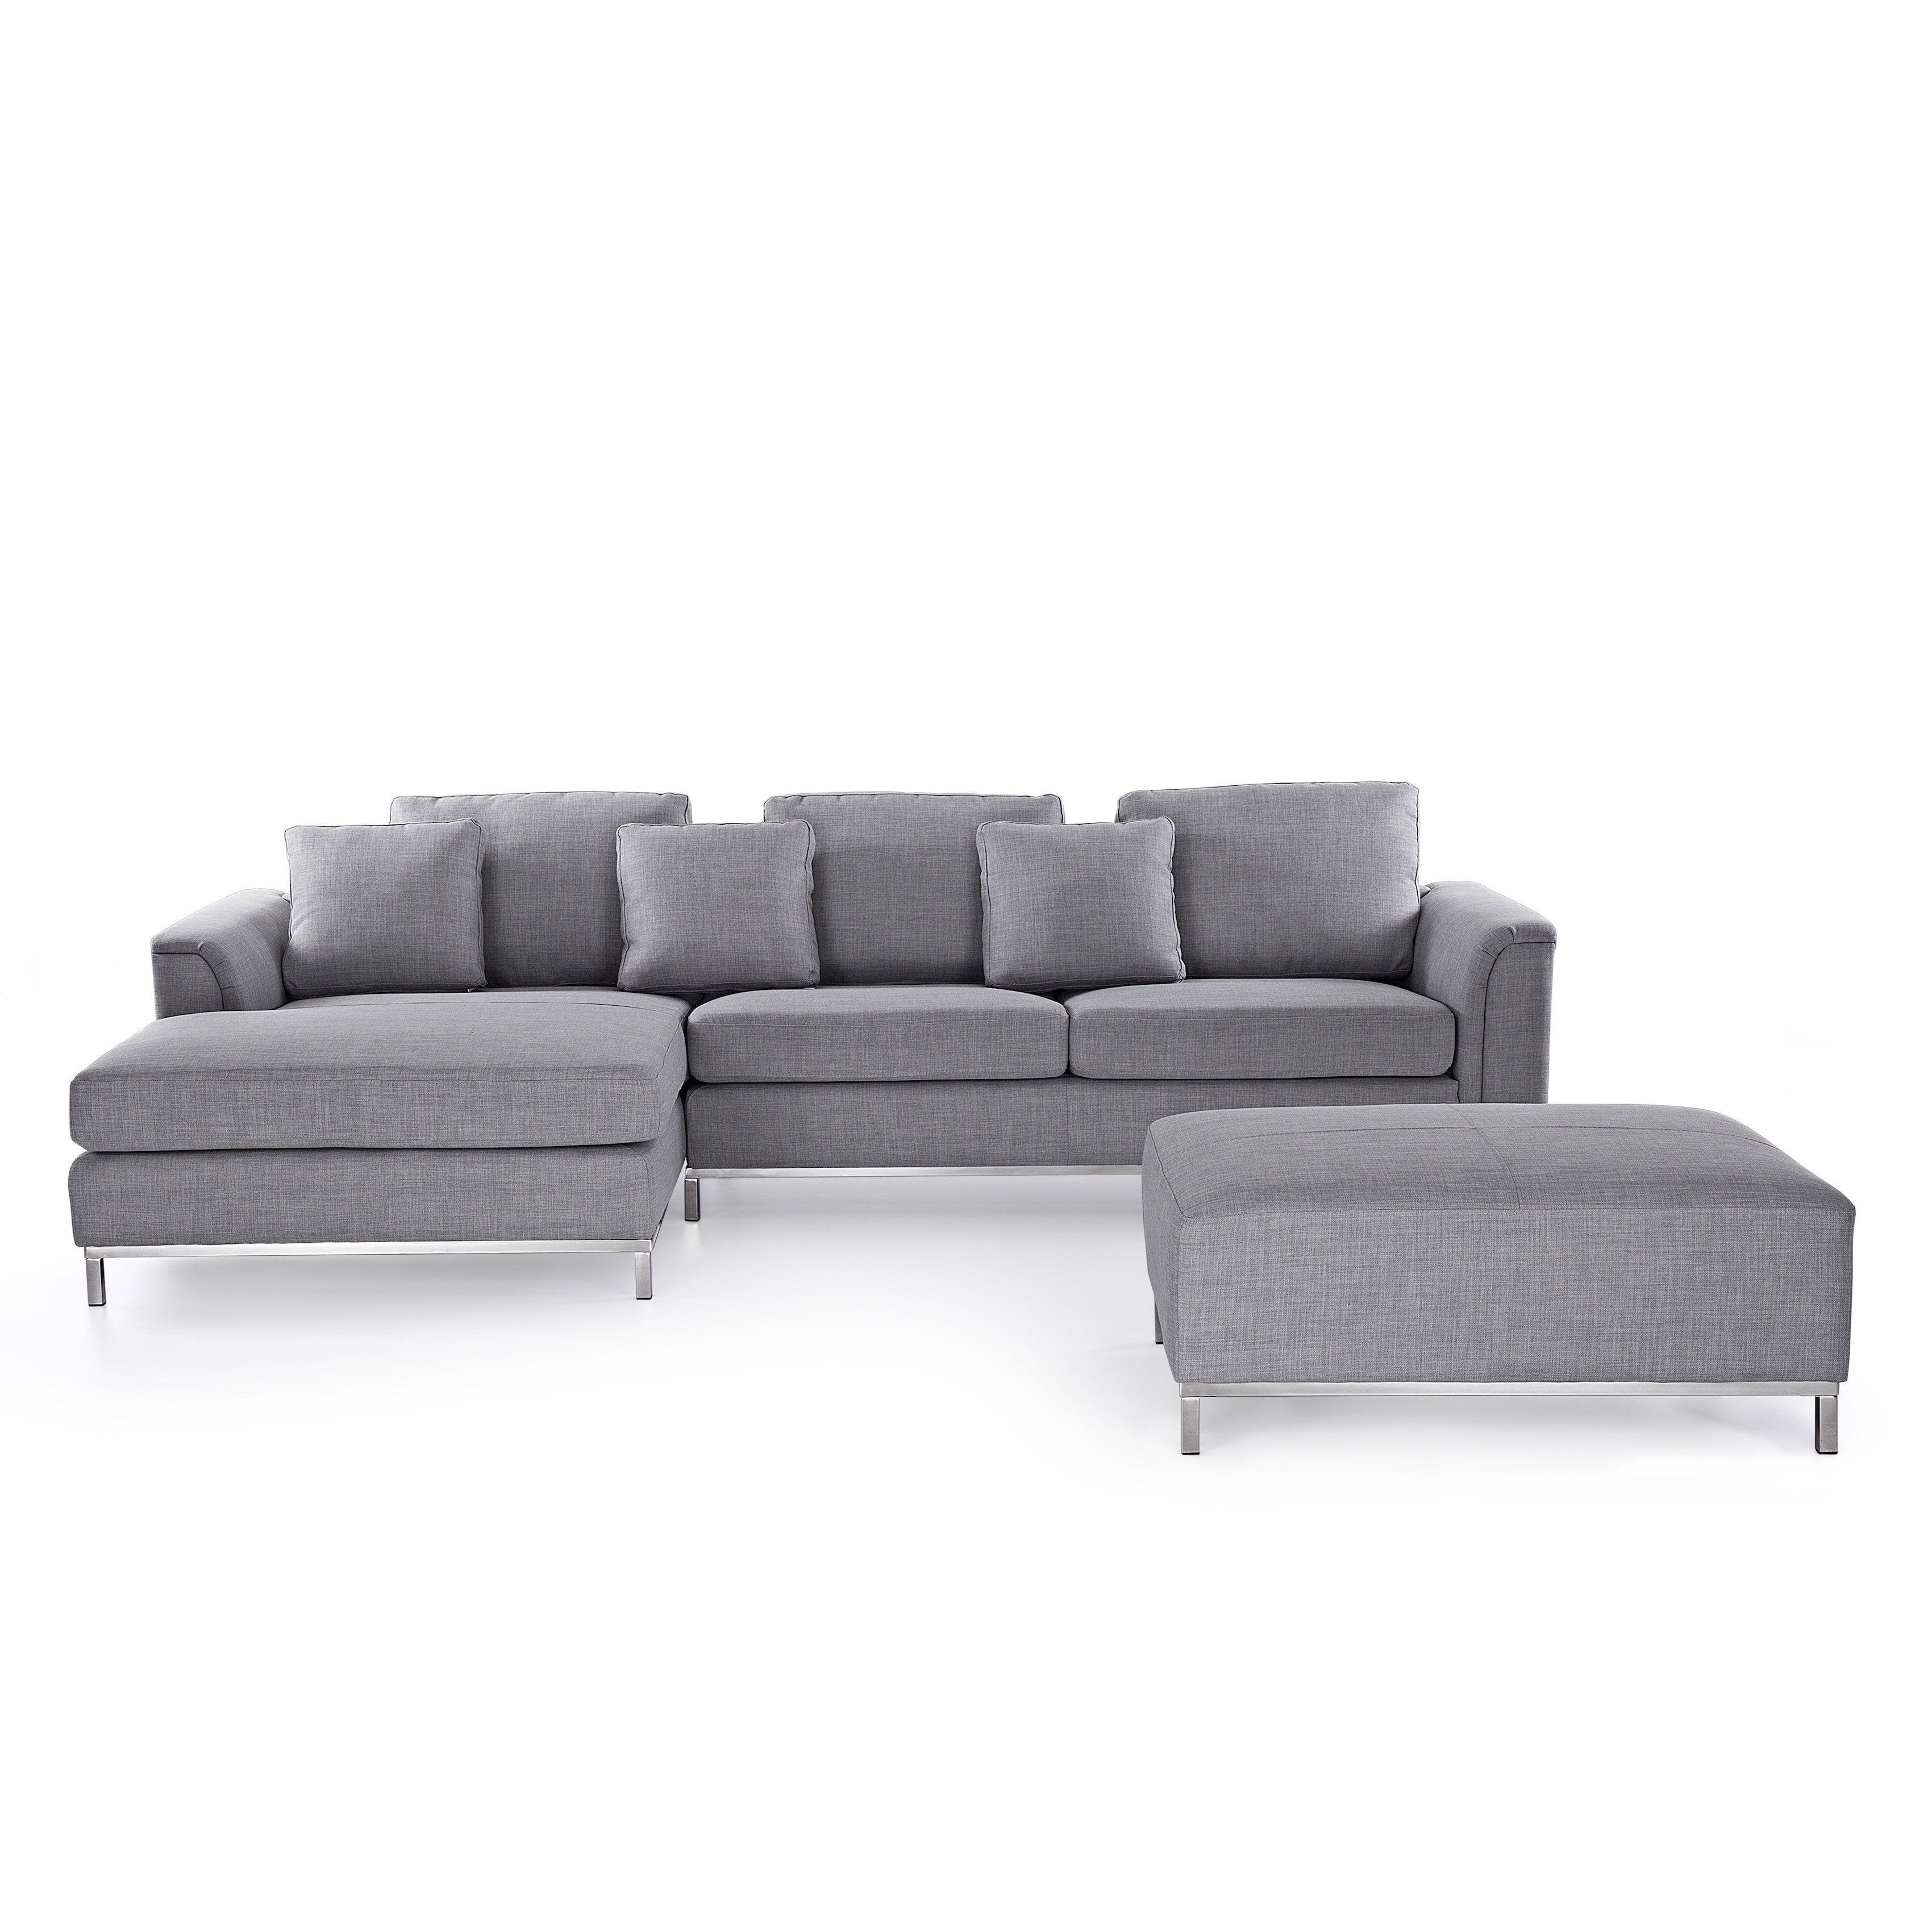 Beliani Oslo Modern Sectional Sofa with Ottoman Oslo Light Grey